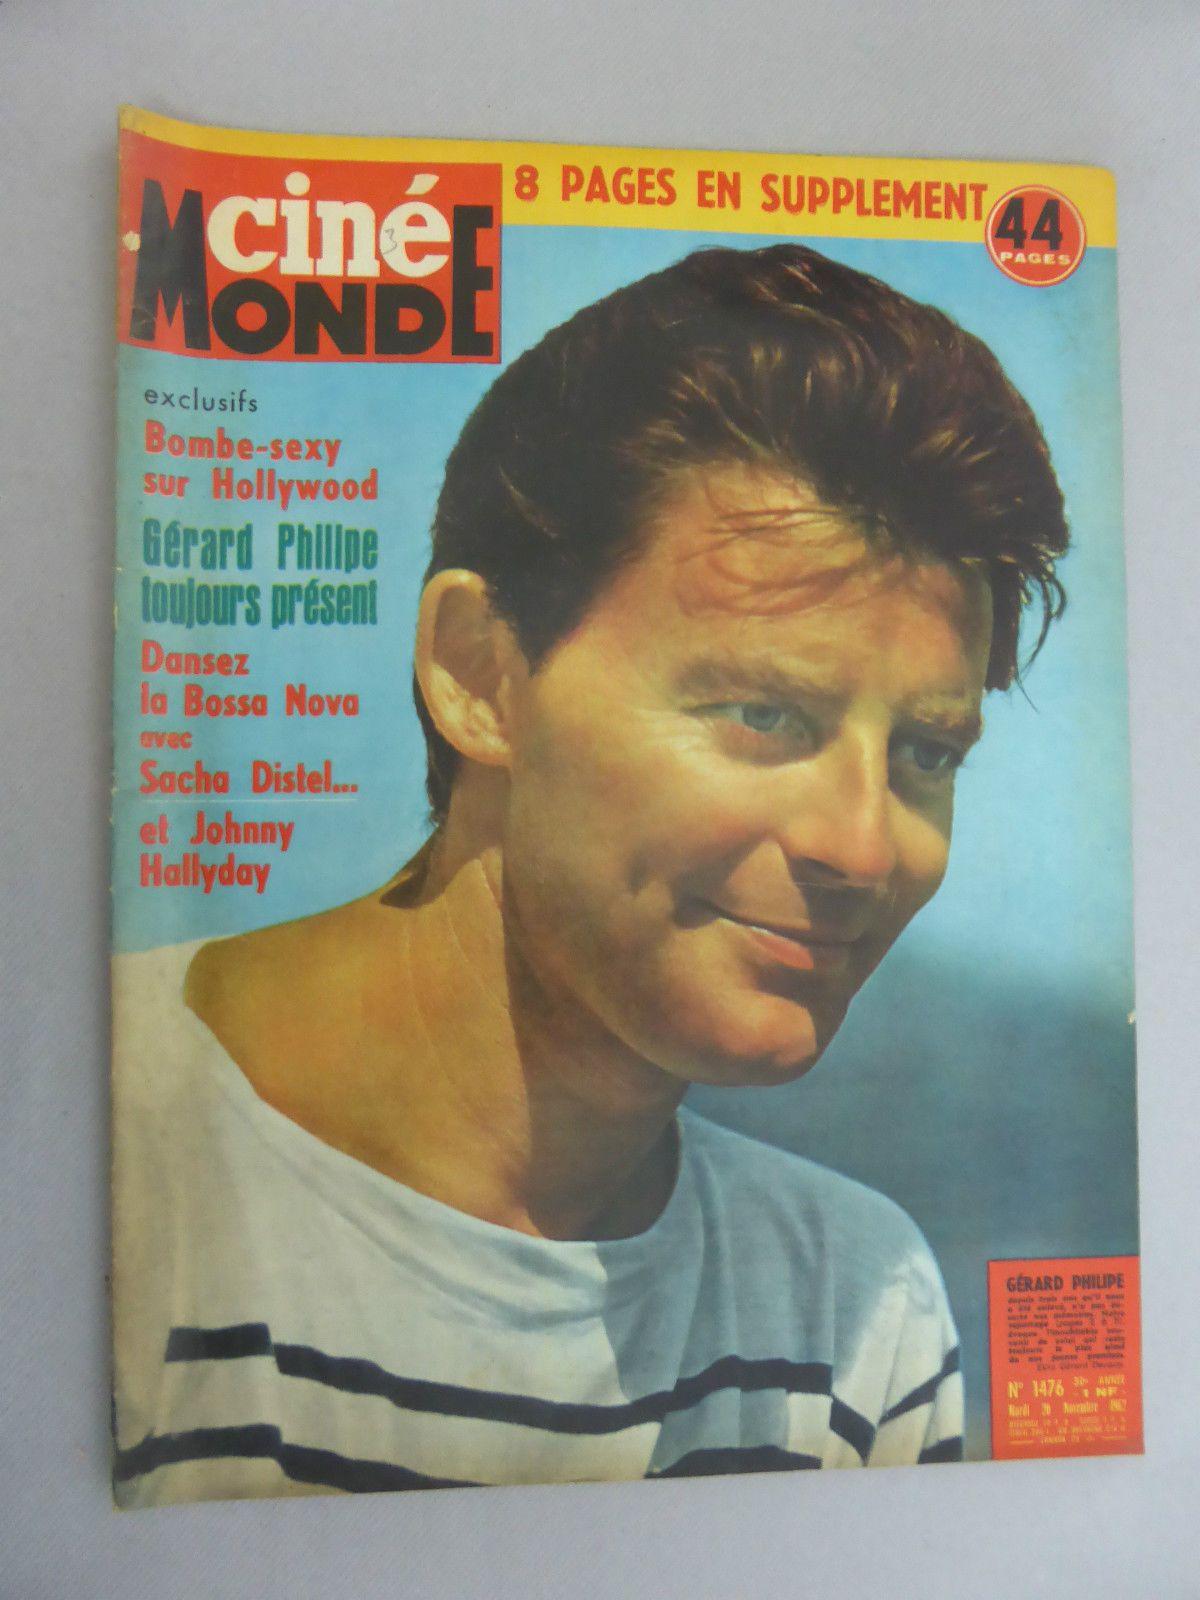 CINEMONDE 1962 GERARD PHILIPPE SACHA DISTEL BREL REVUE HEBDOMADAIRE | eBay